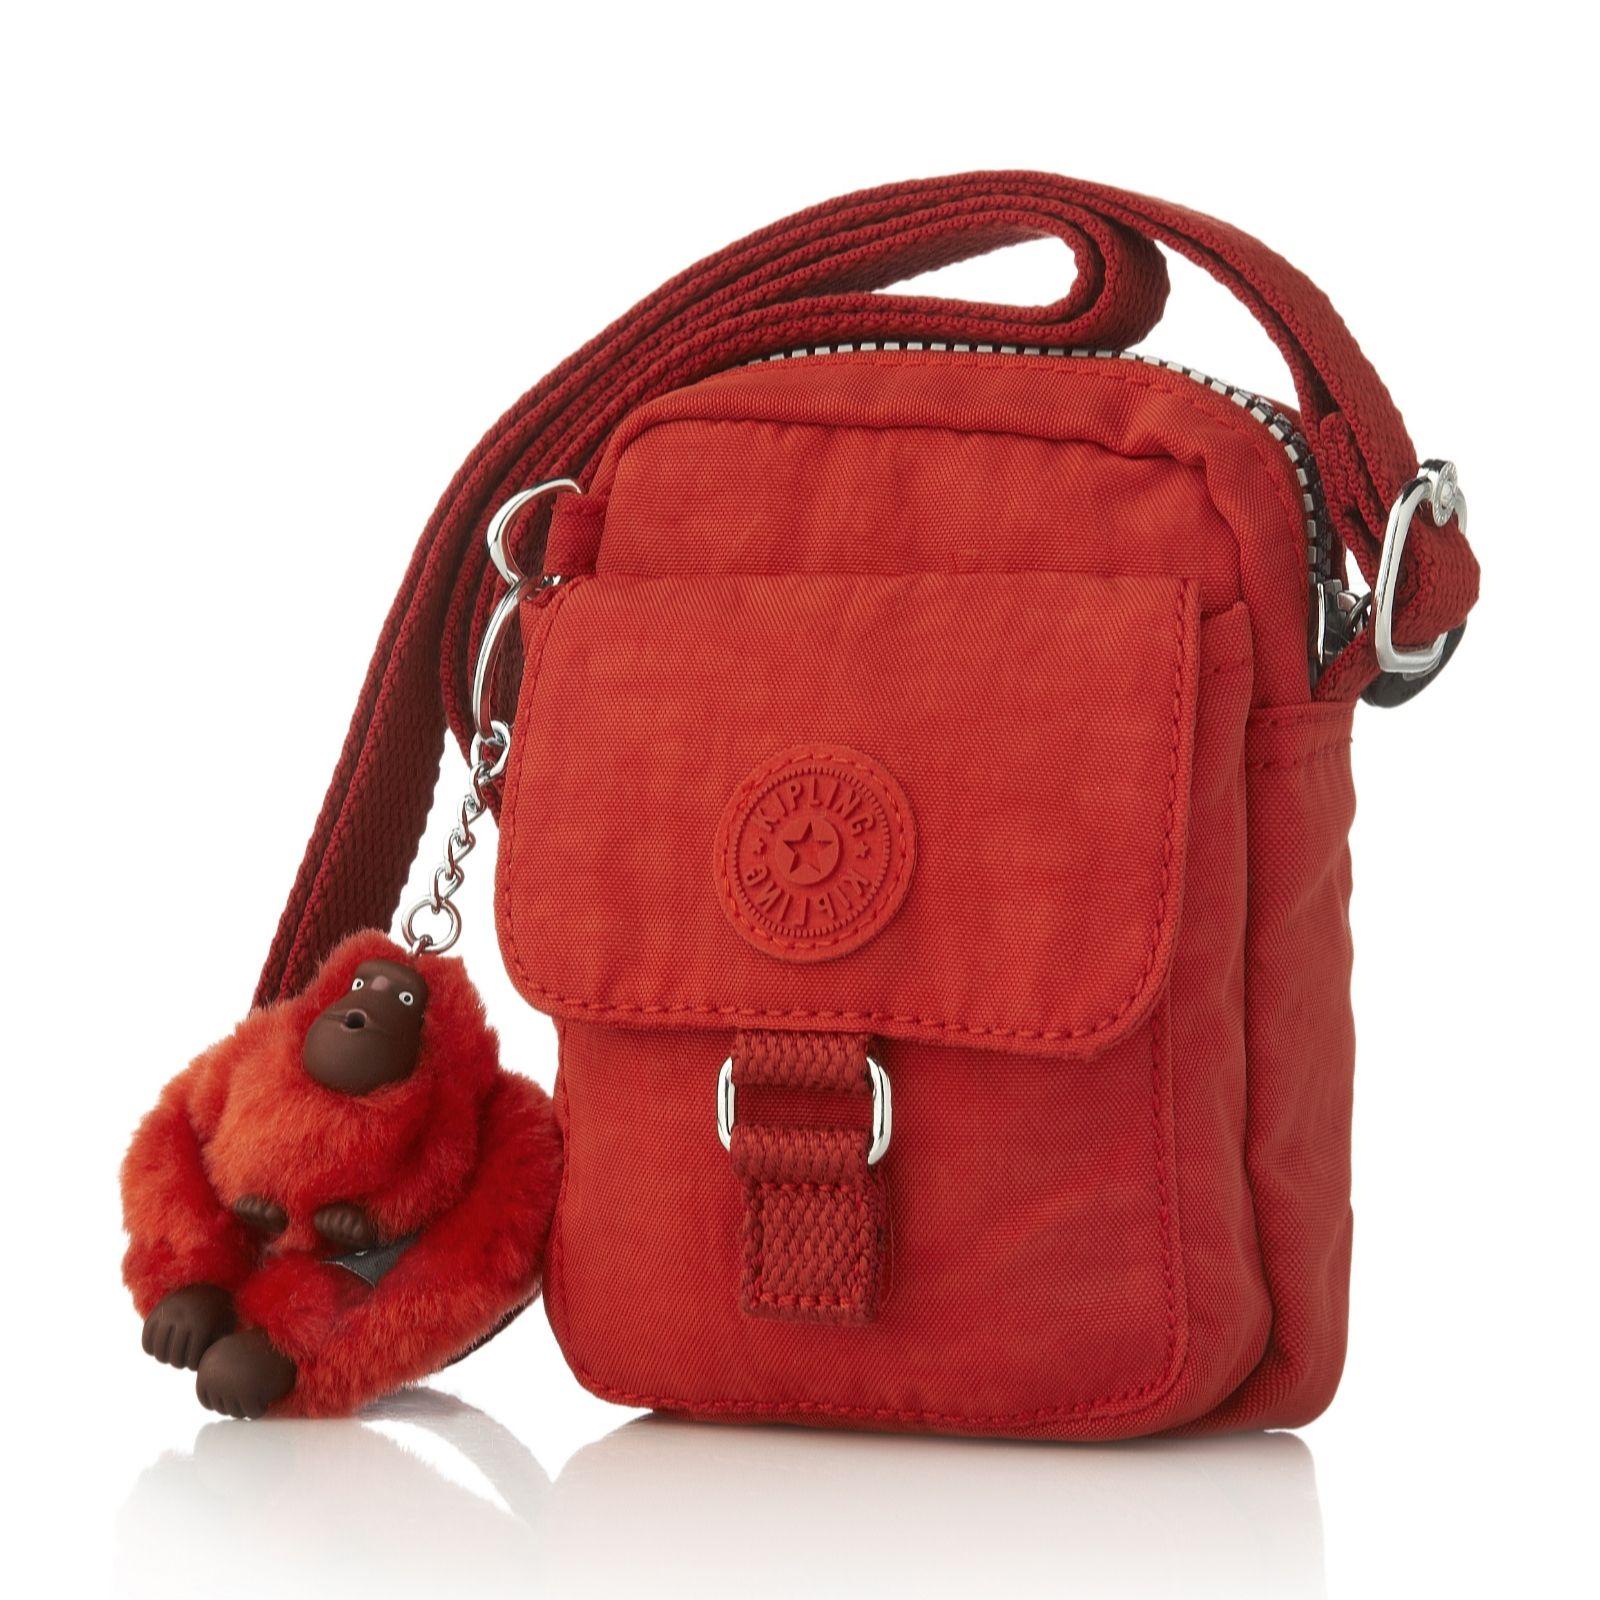 b01366e57 Kipling Teddy Kids Shoulder Bag with Flapover - Page 1 - QVC UK